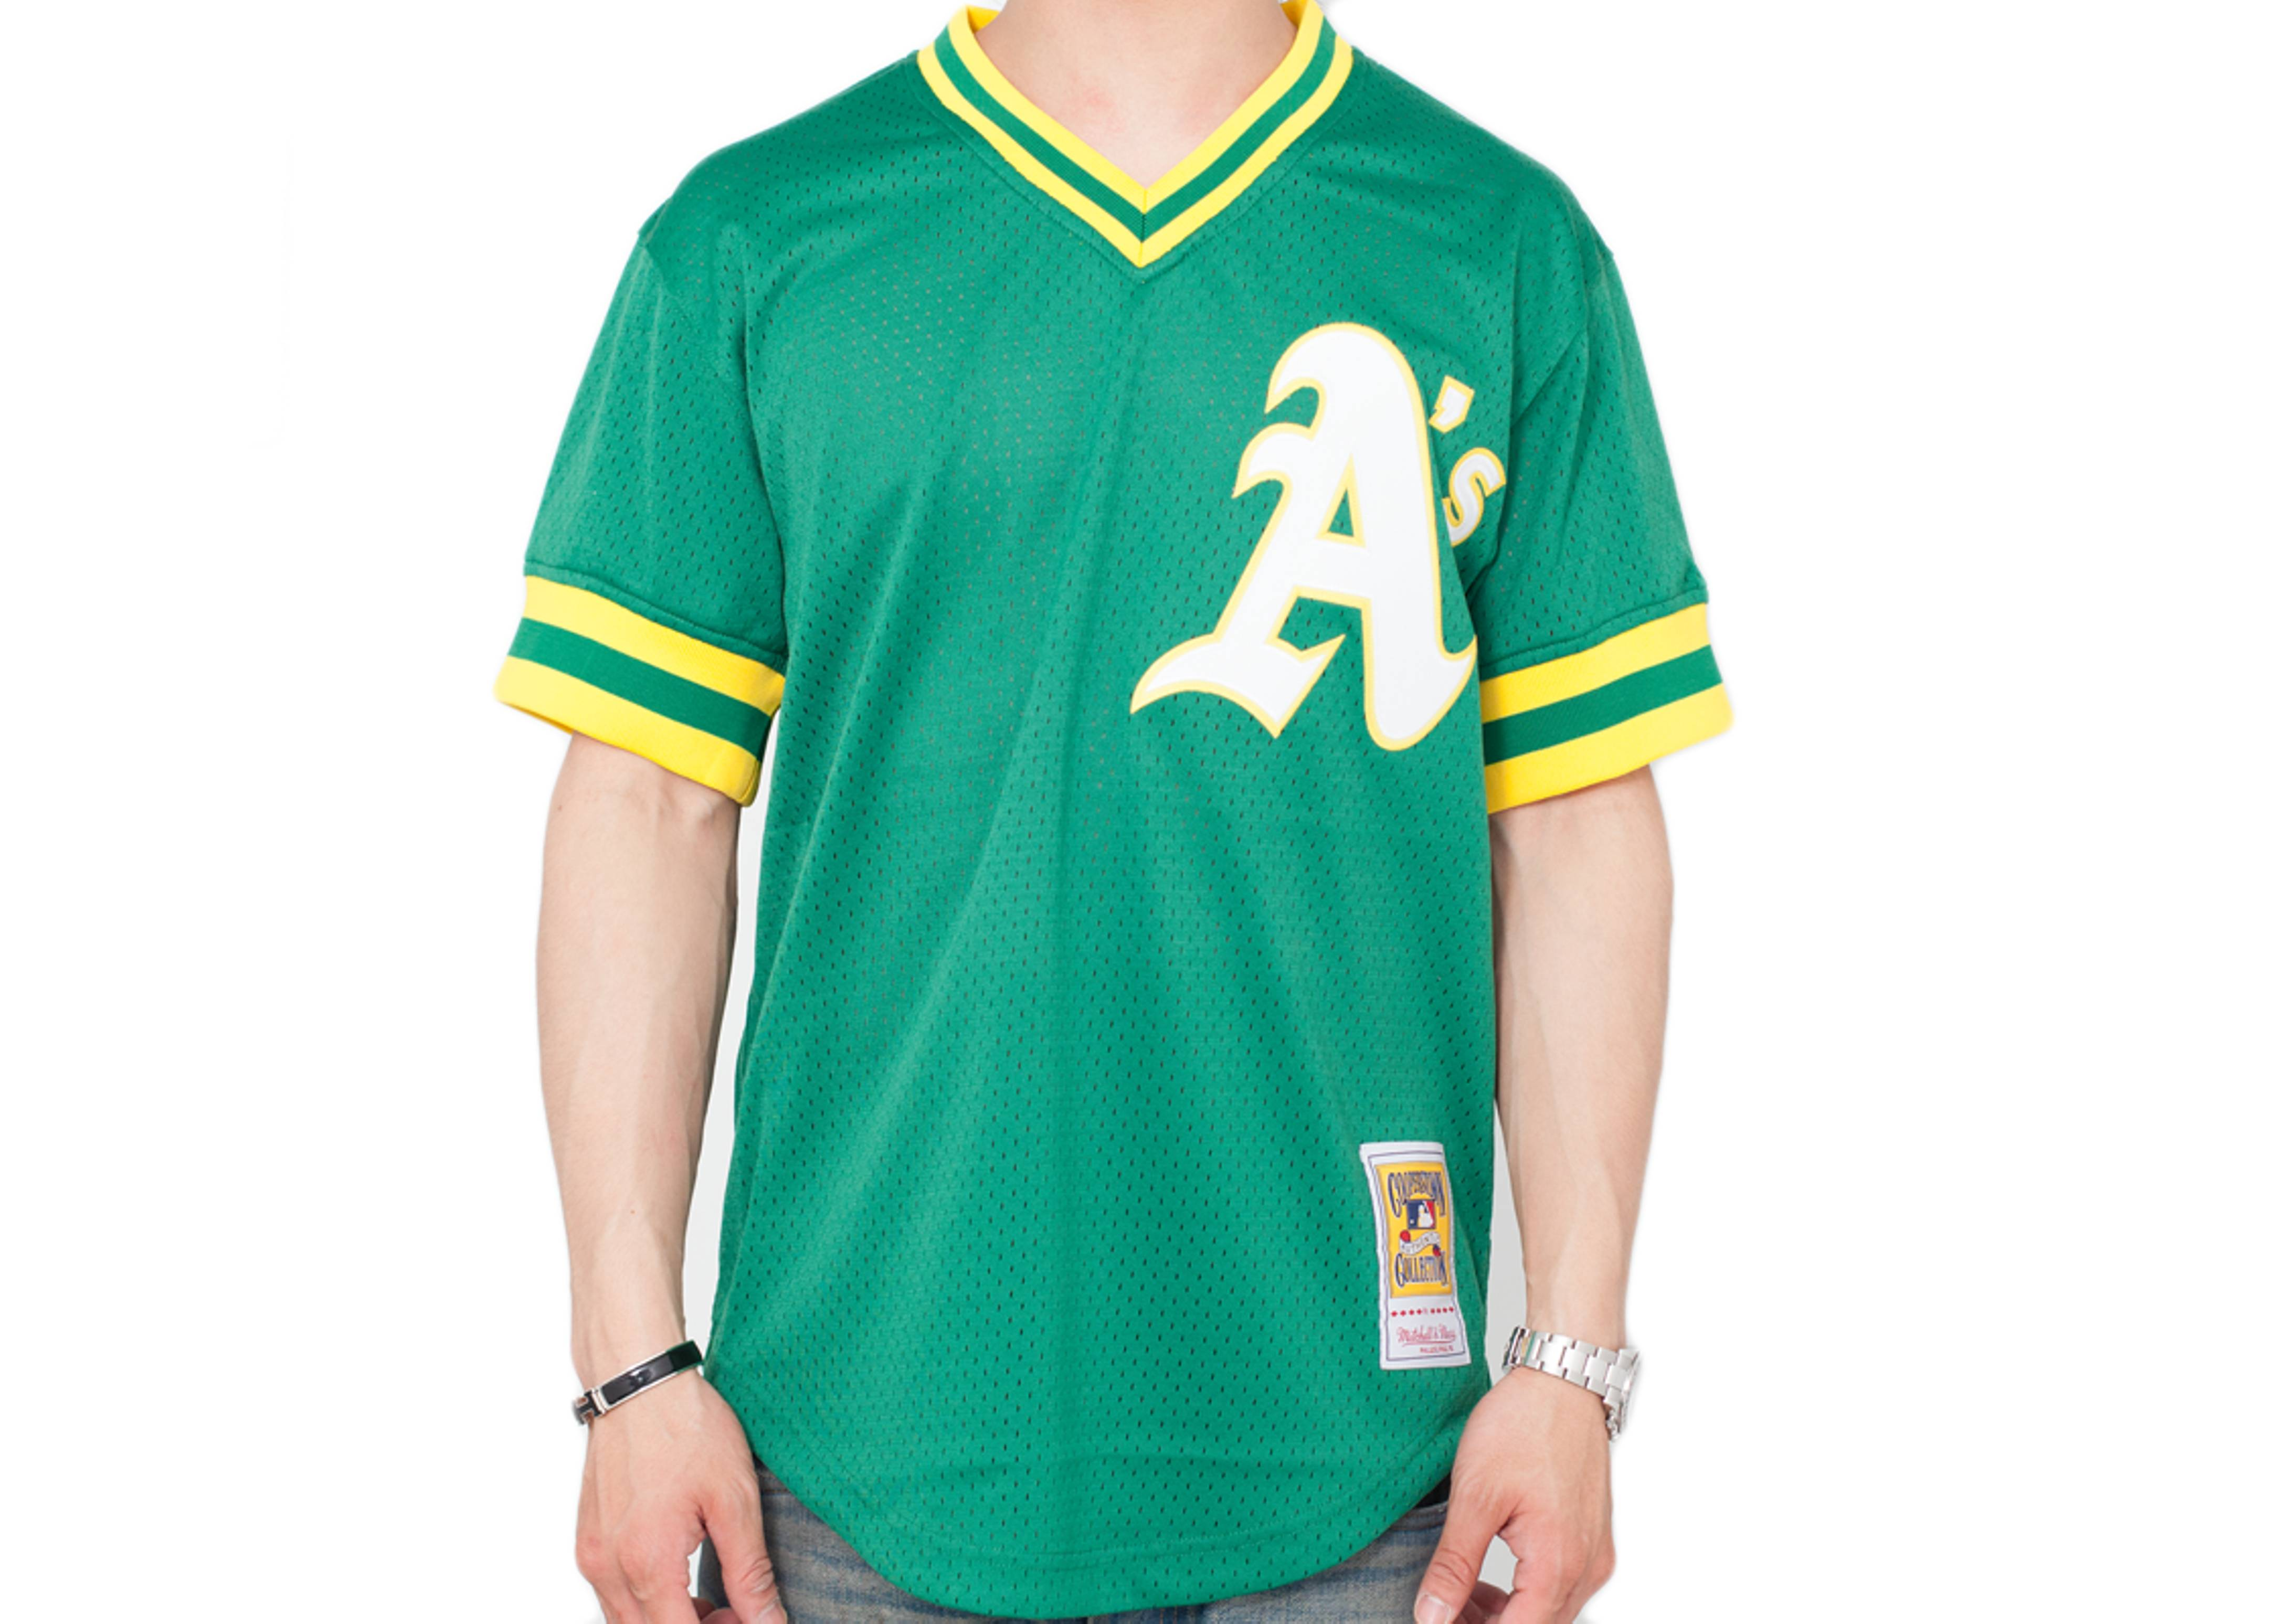 cheap for discount 381d9 6a22e Oakland Athletics Authentic Mesh Bp Jersey